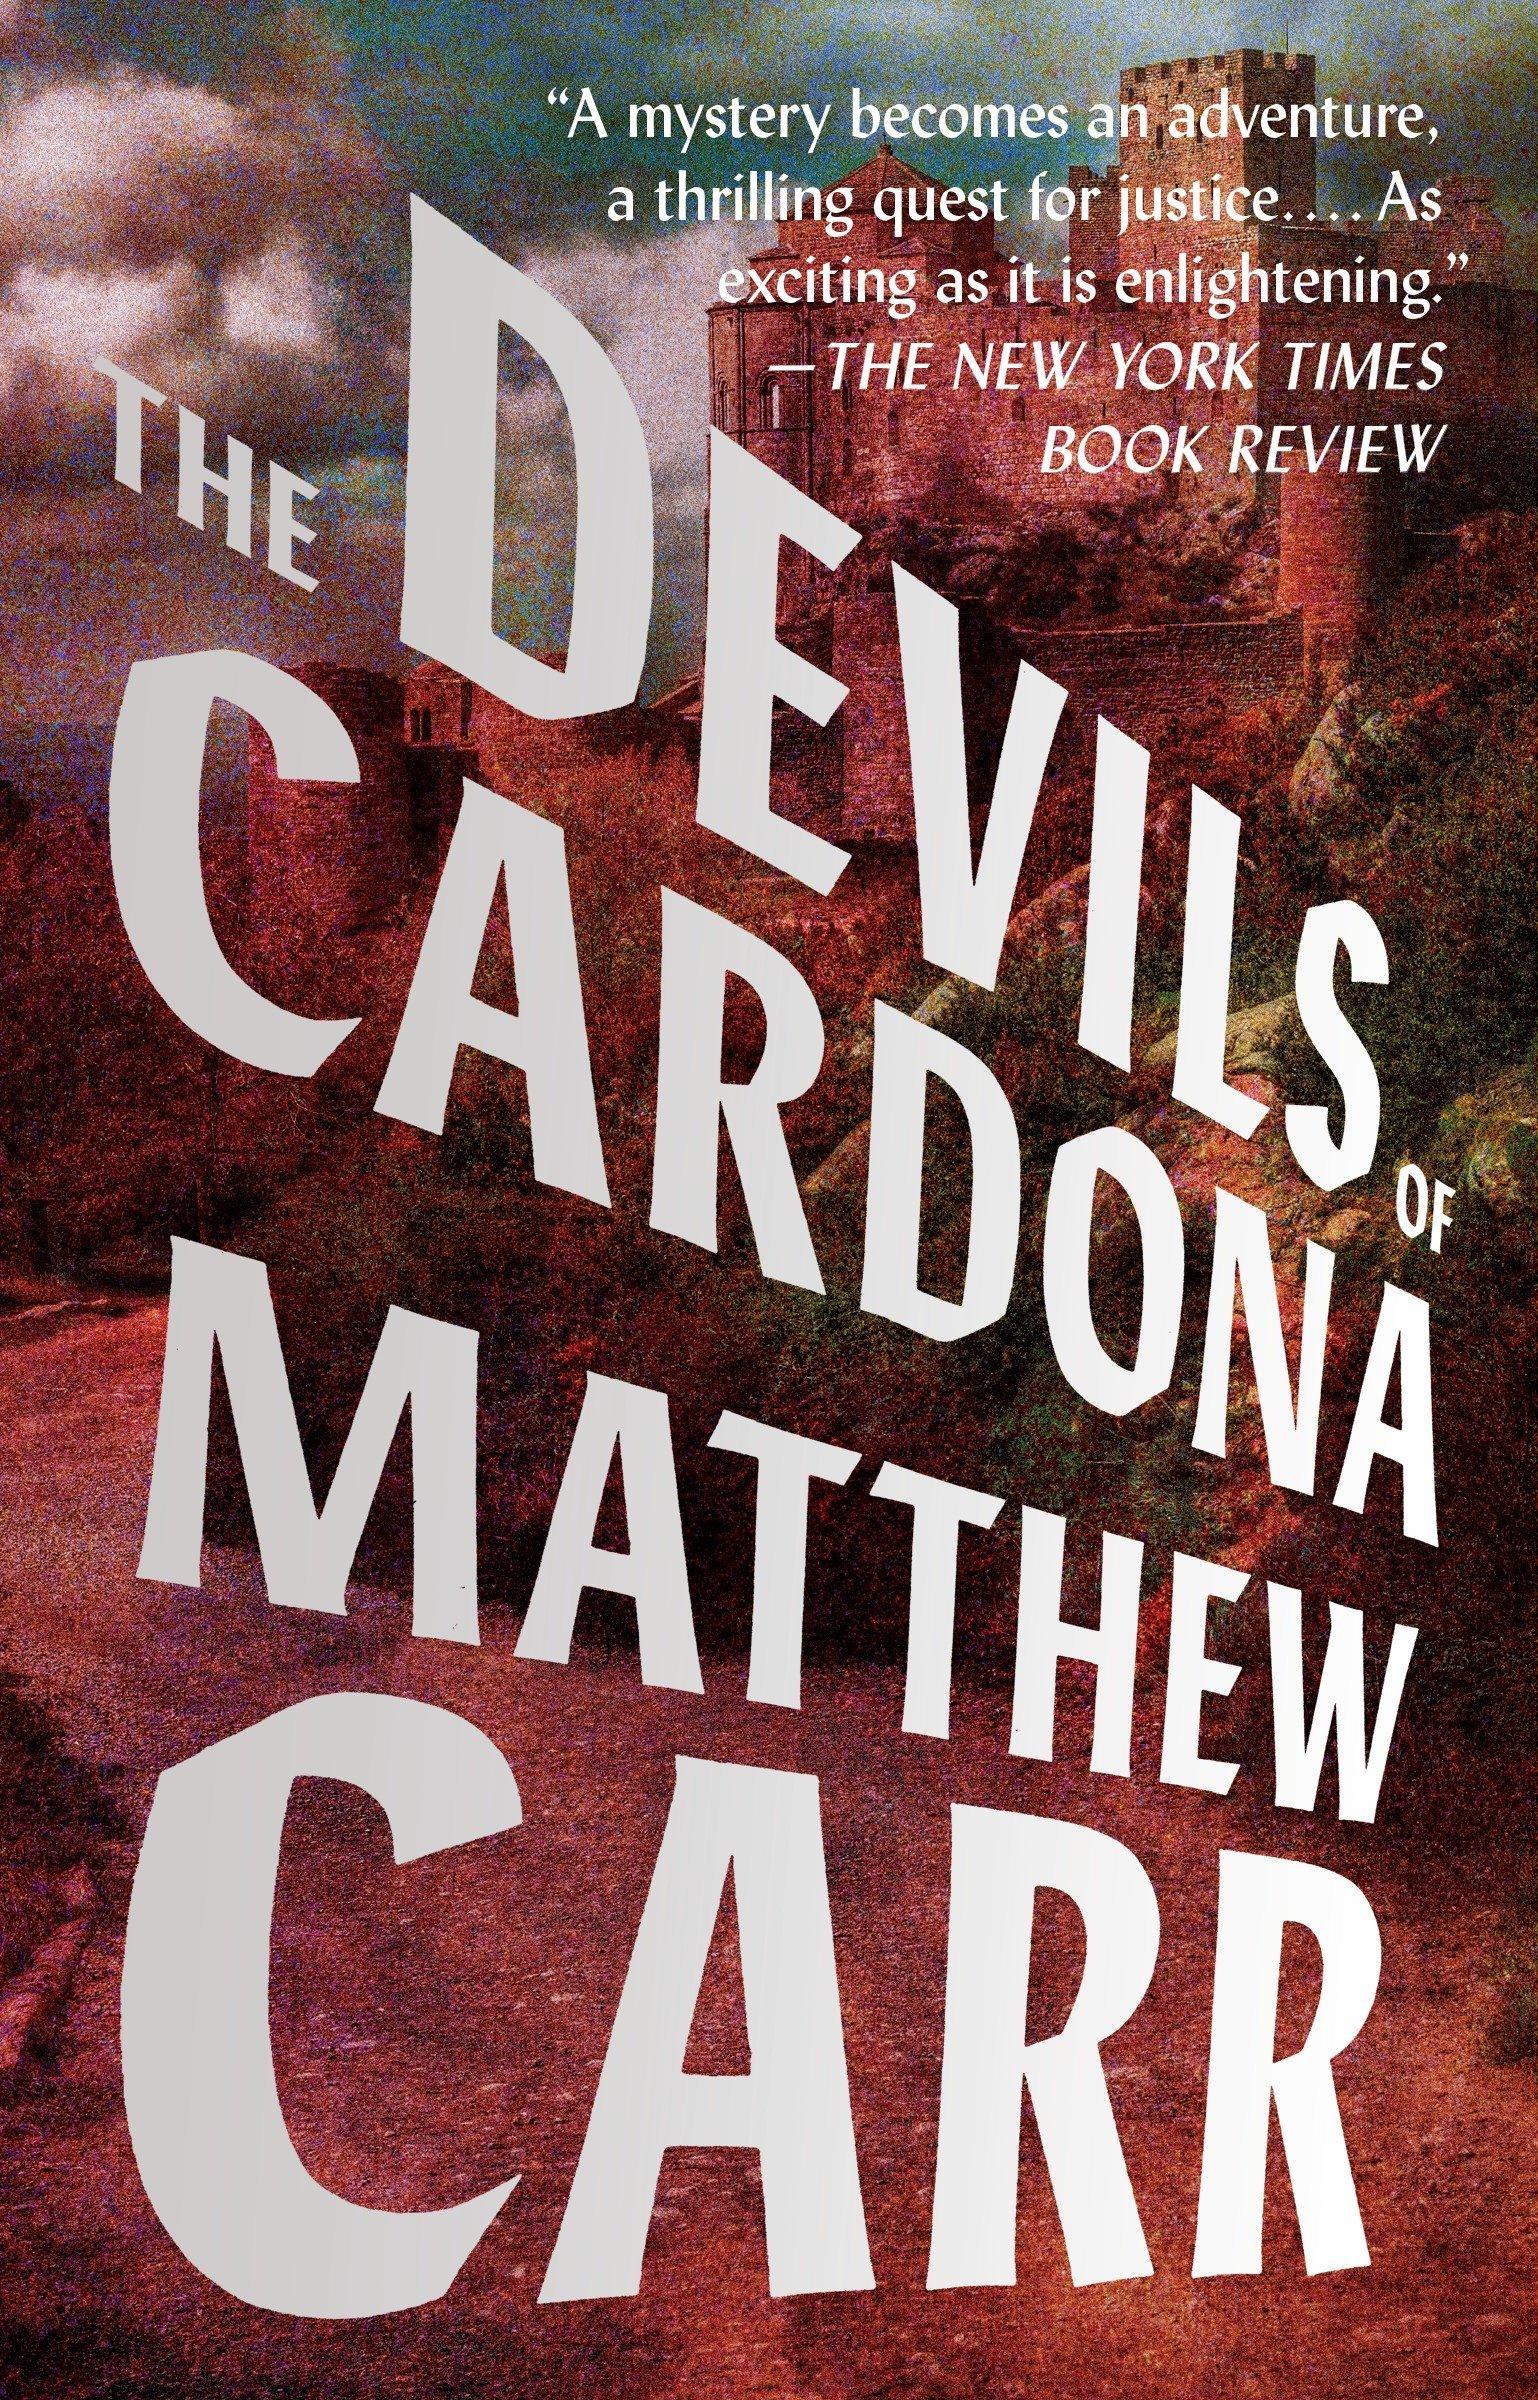 Amazon com: The Devils of Cardona (9781101982747): Matthew